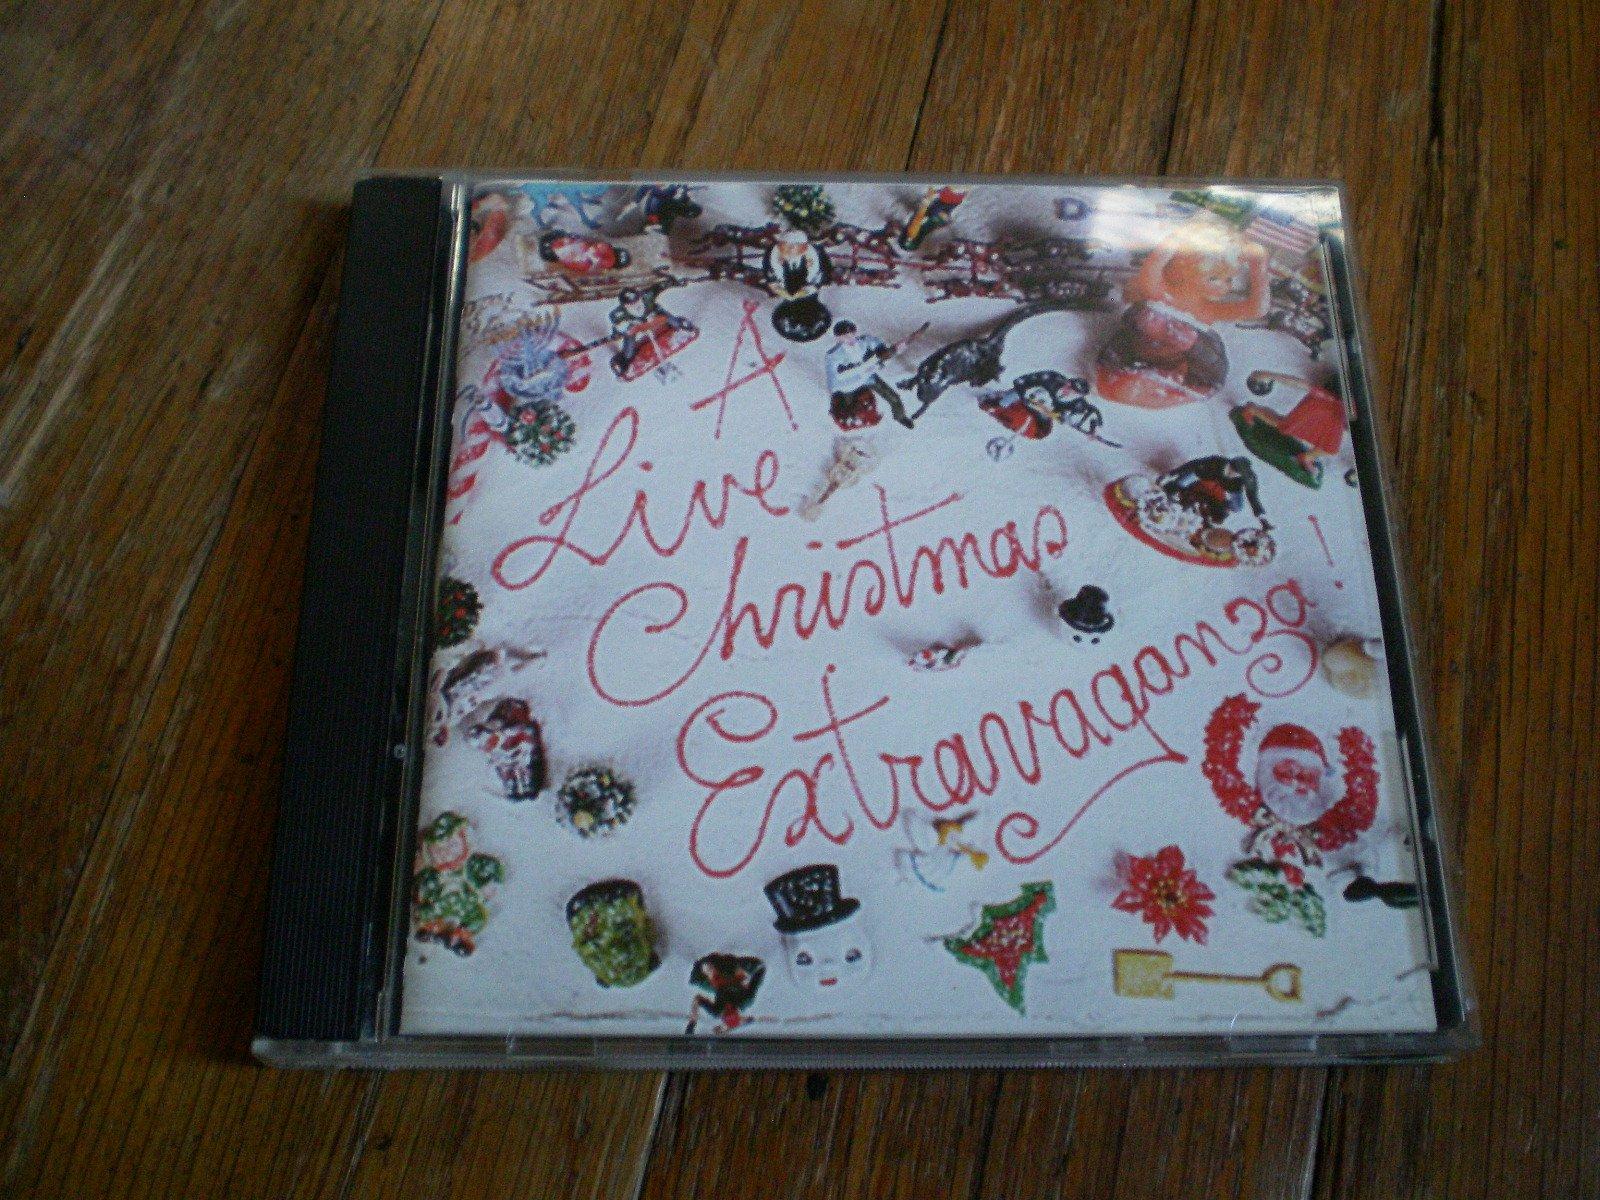 Live Christmas Extravaganza by Deko Music